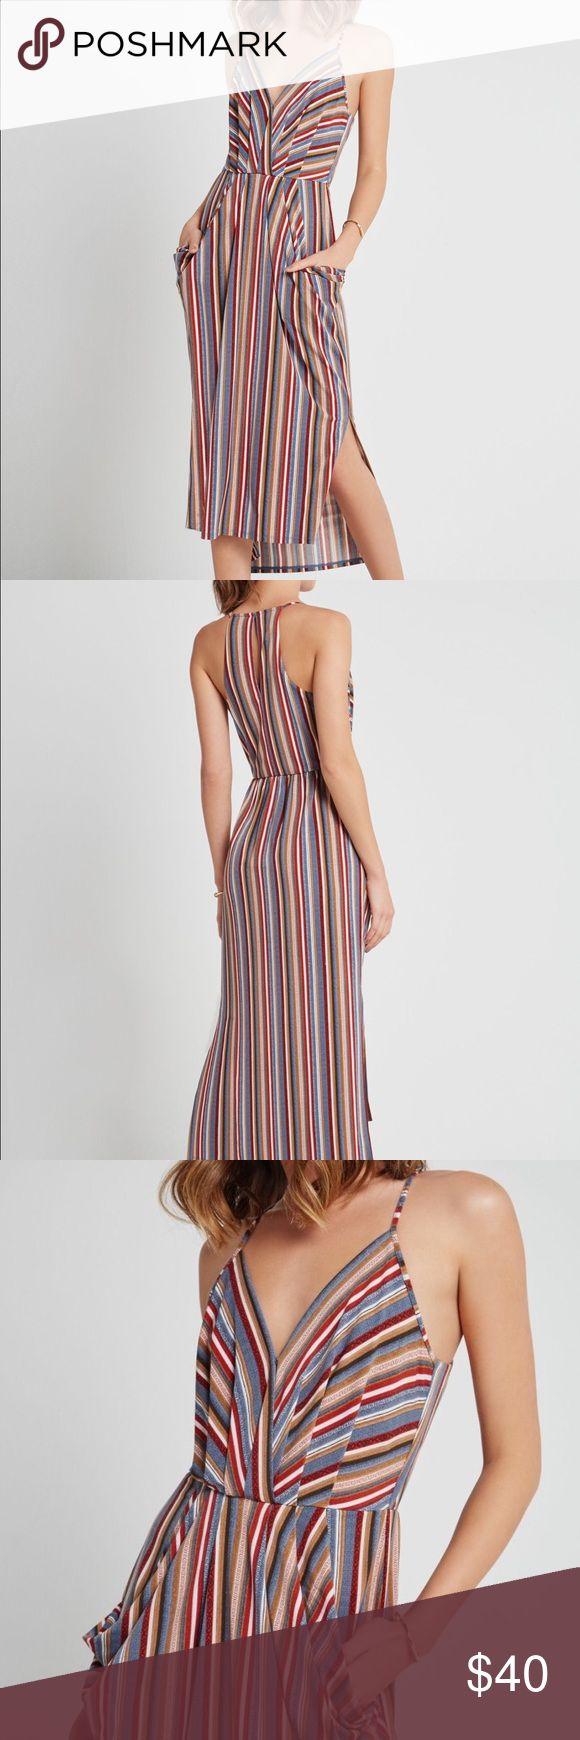 BCBG striped midi dress This dress is so cute! Striped midi length dress, cinches at waist, and has pockets! Who doesn't love pockets. BCBG Dresses Midi